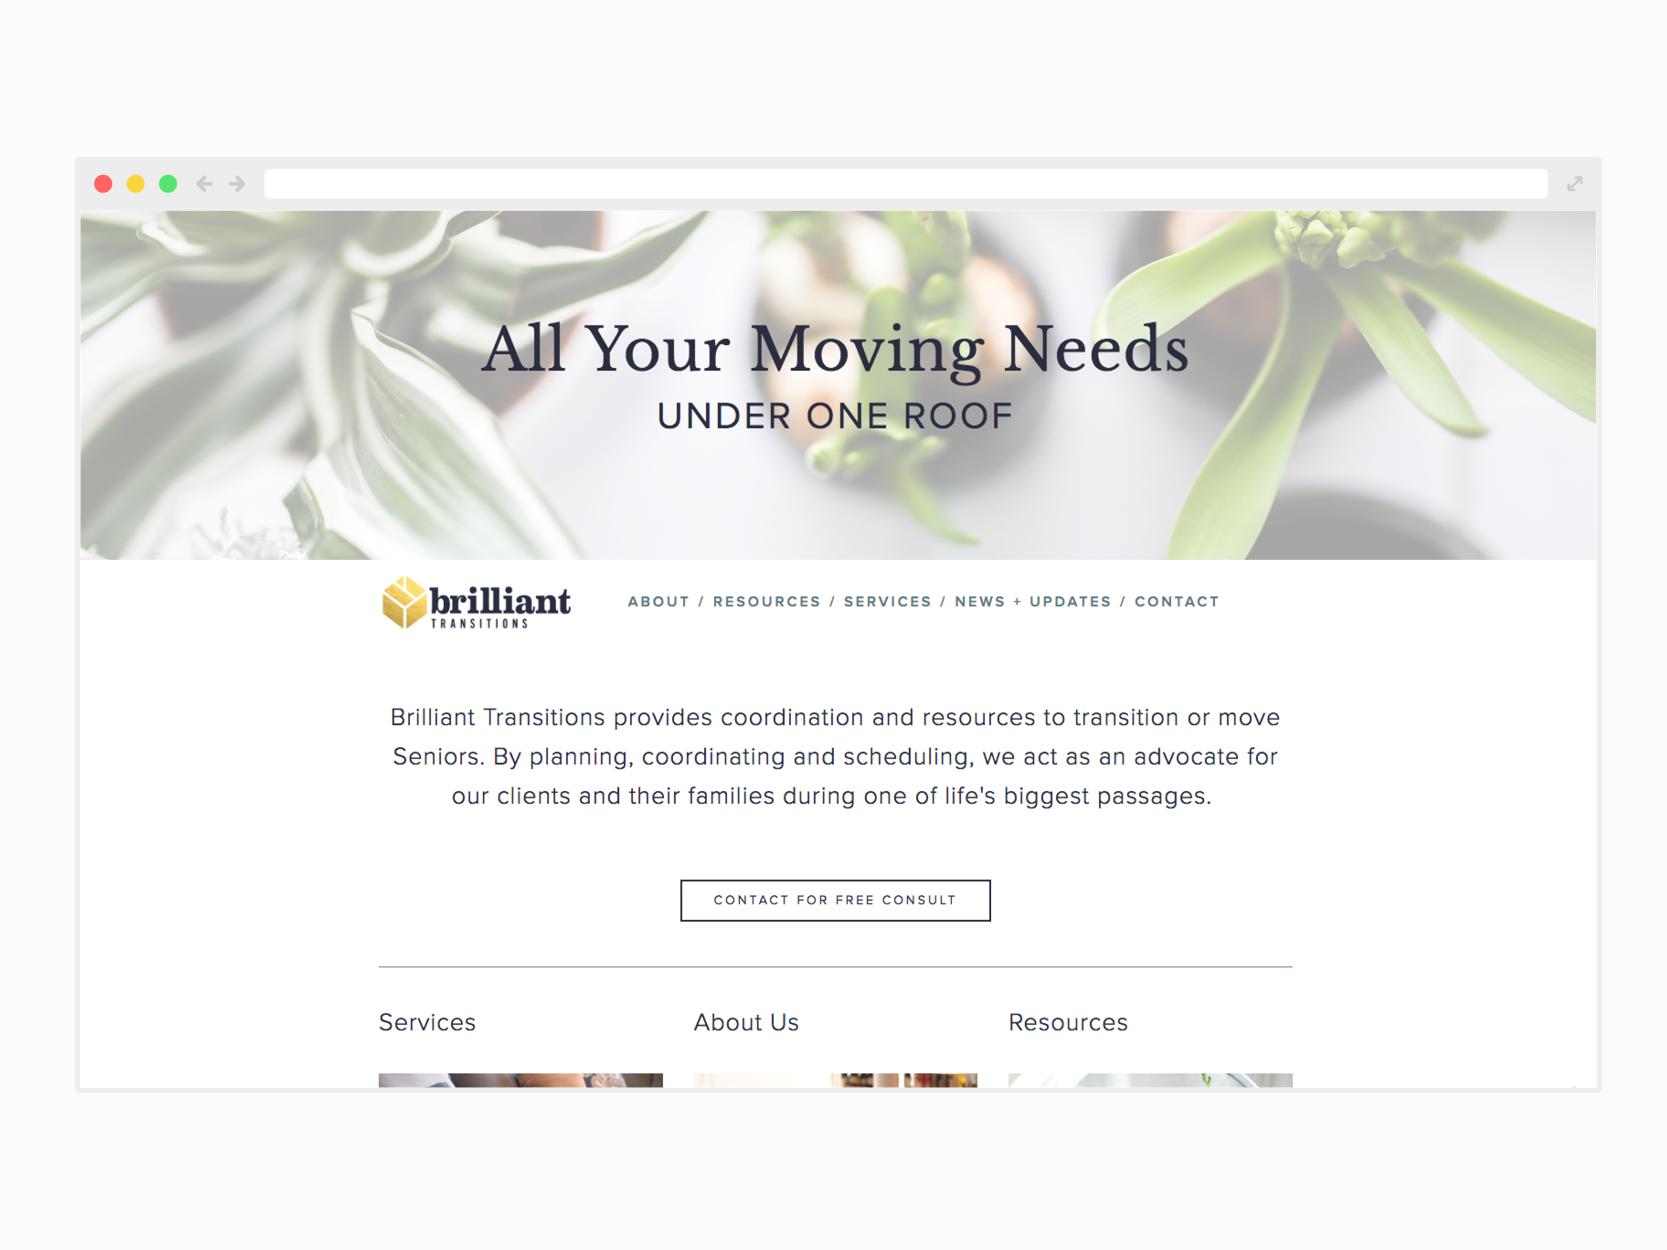 southofbelmar_squaresapce_website6.jpg